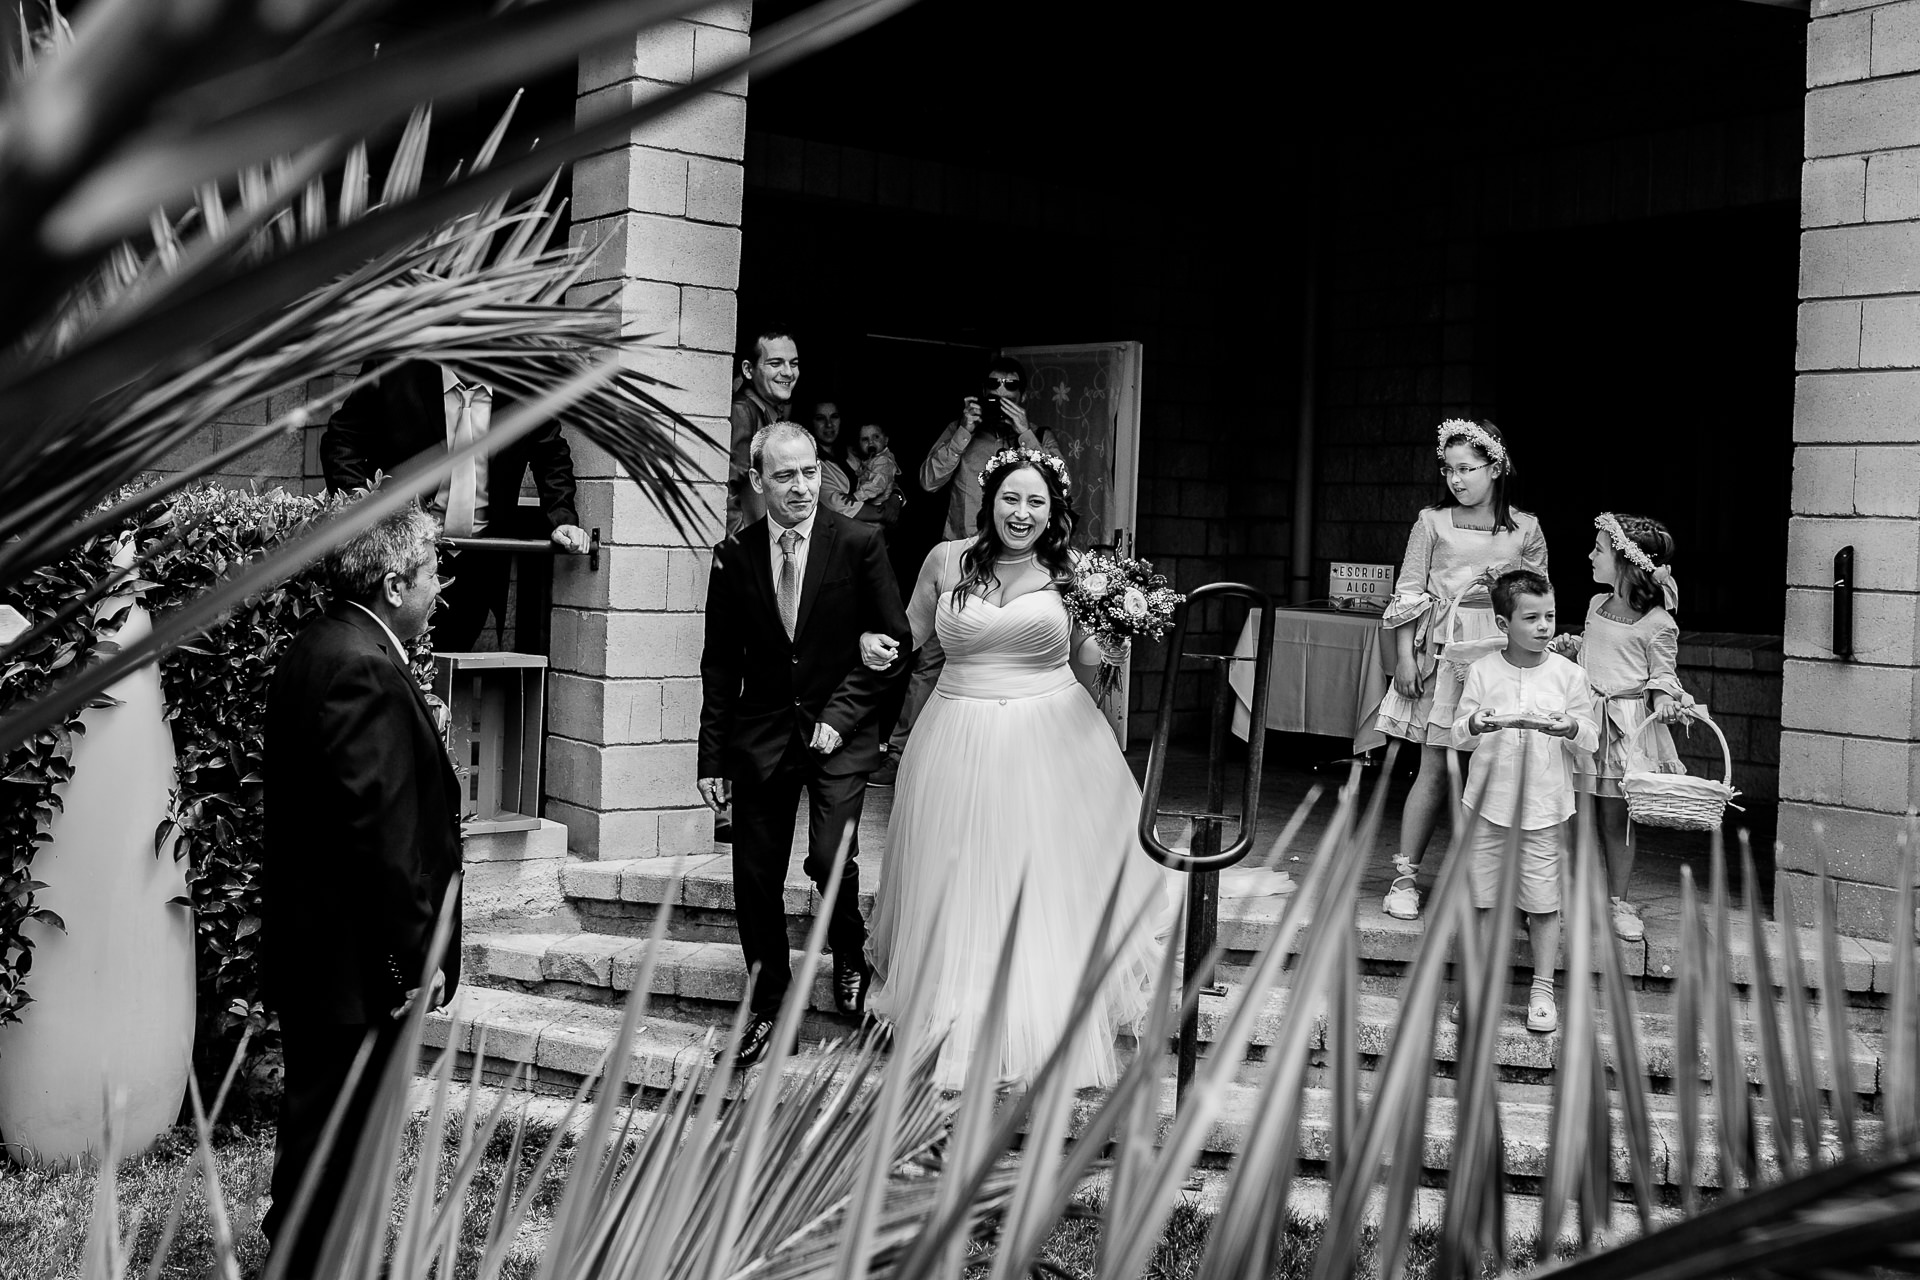 boda civil restaurante lola 125020